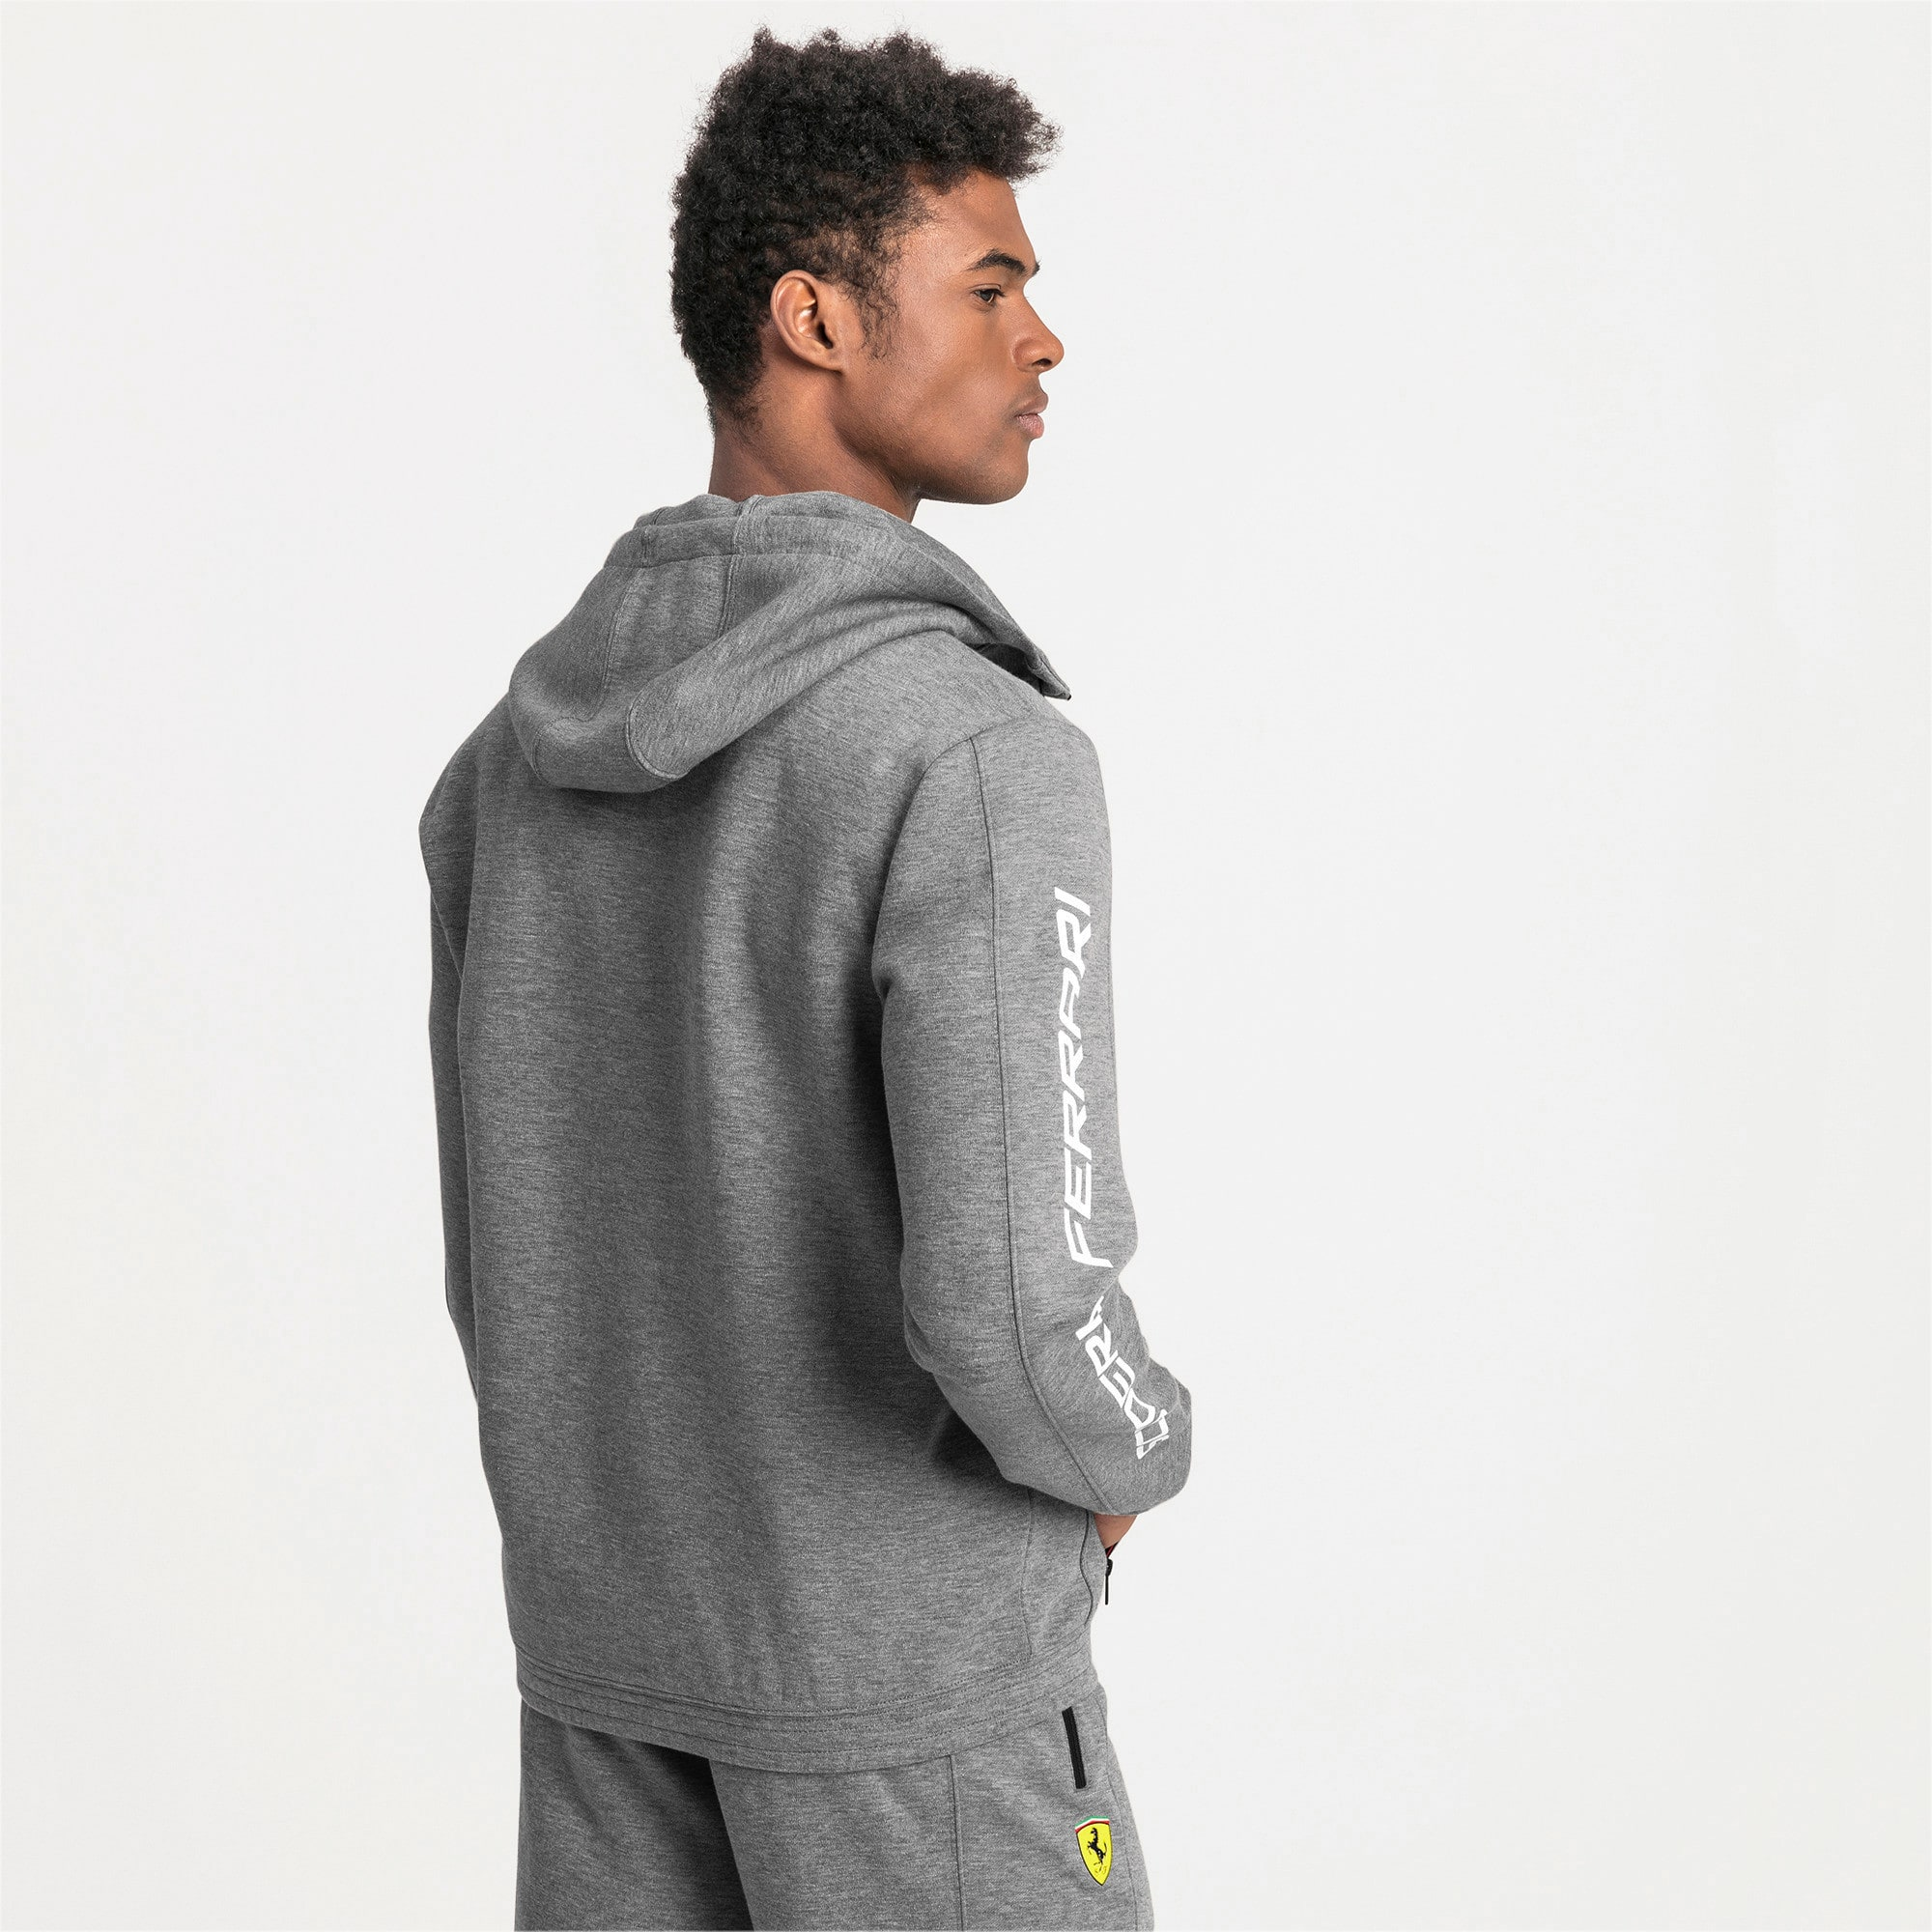 Thumbnail 2 of Ferrari Hooded Men's Sweat Jacket, Medium Gray Heather, medium